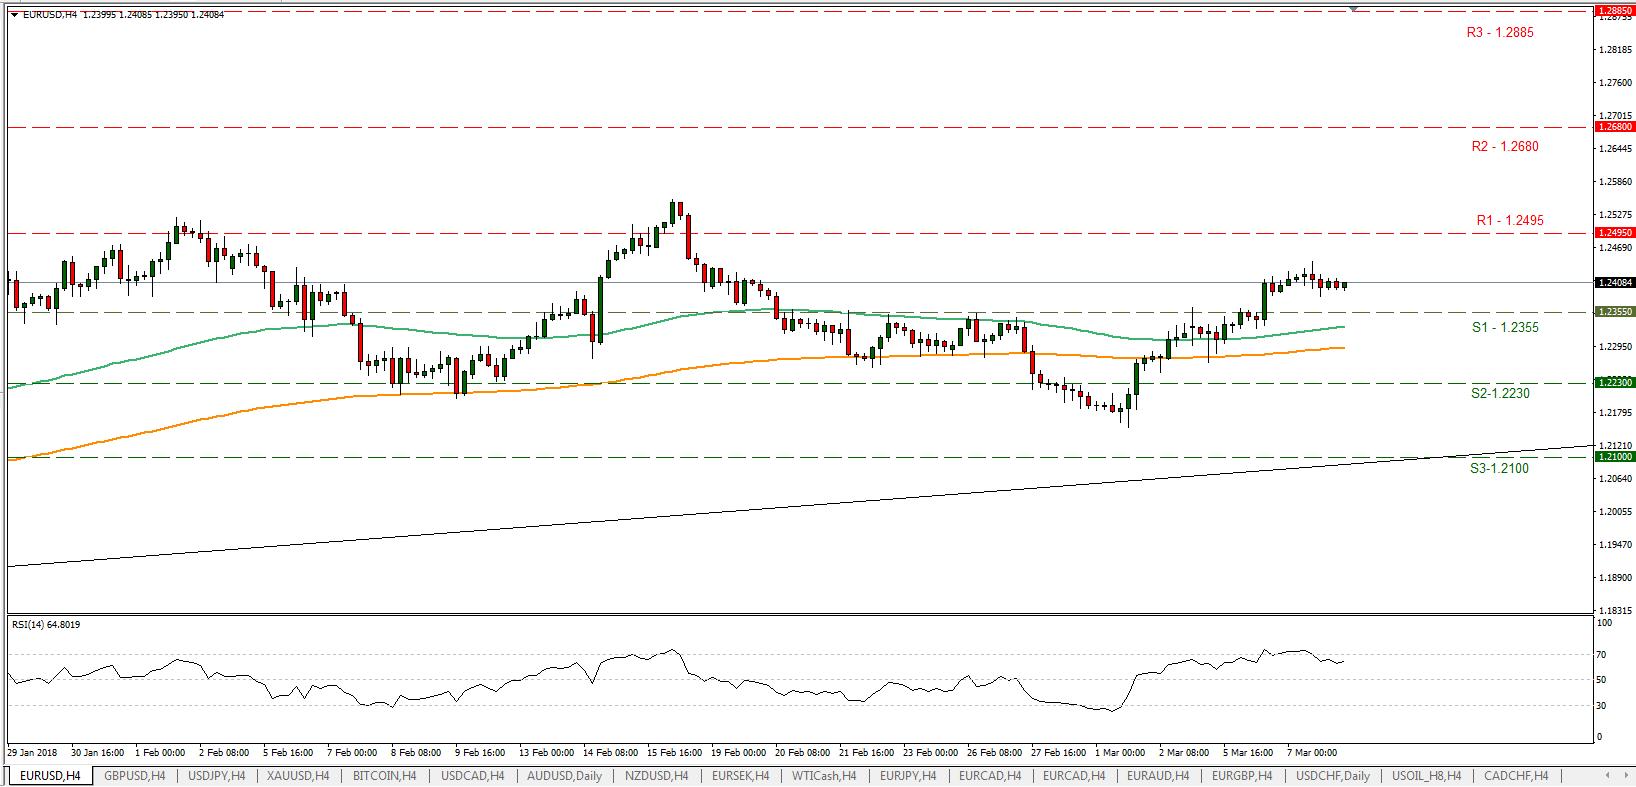 EUR/USD 08/03/2018 | EconAlerts